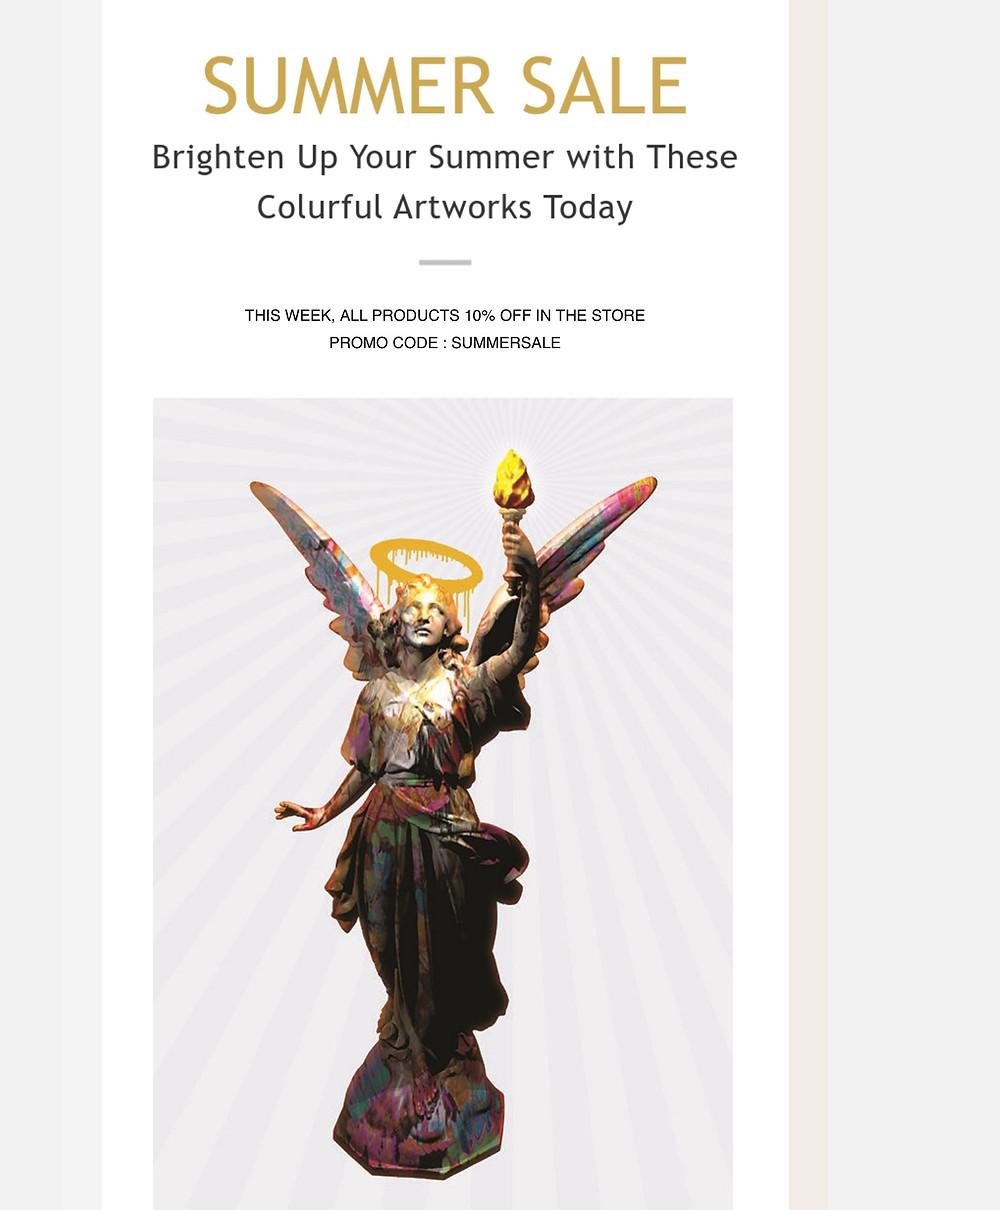 summer sale, promo code